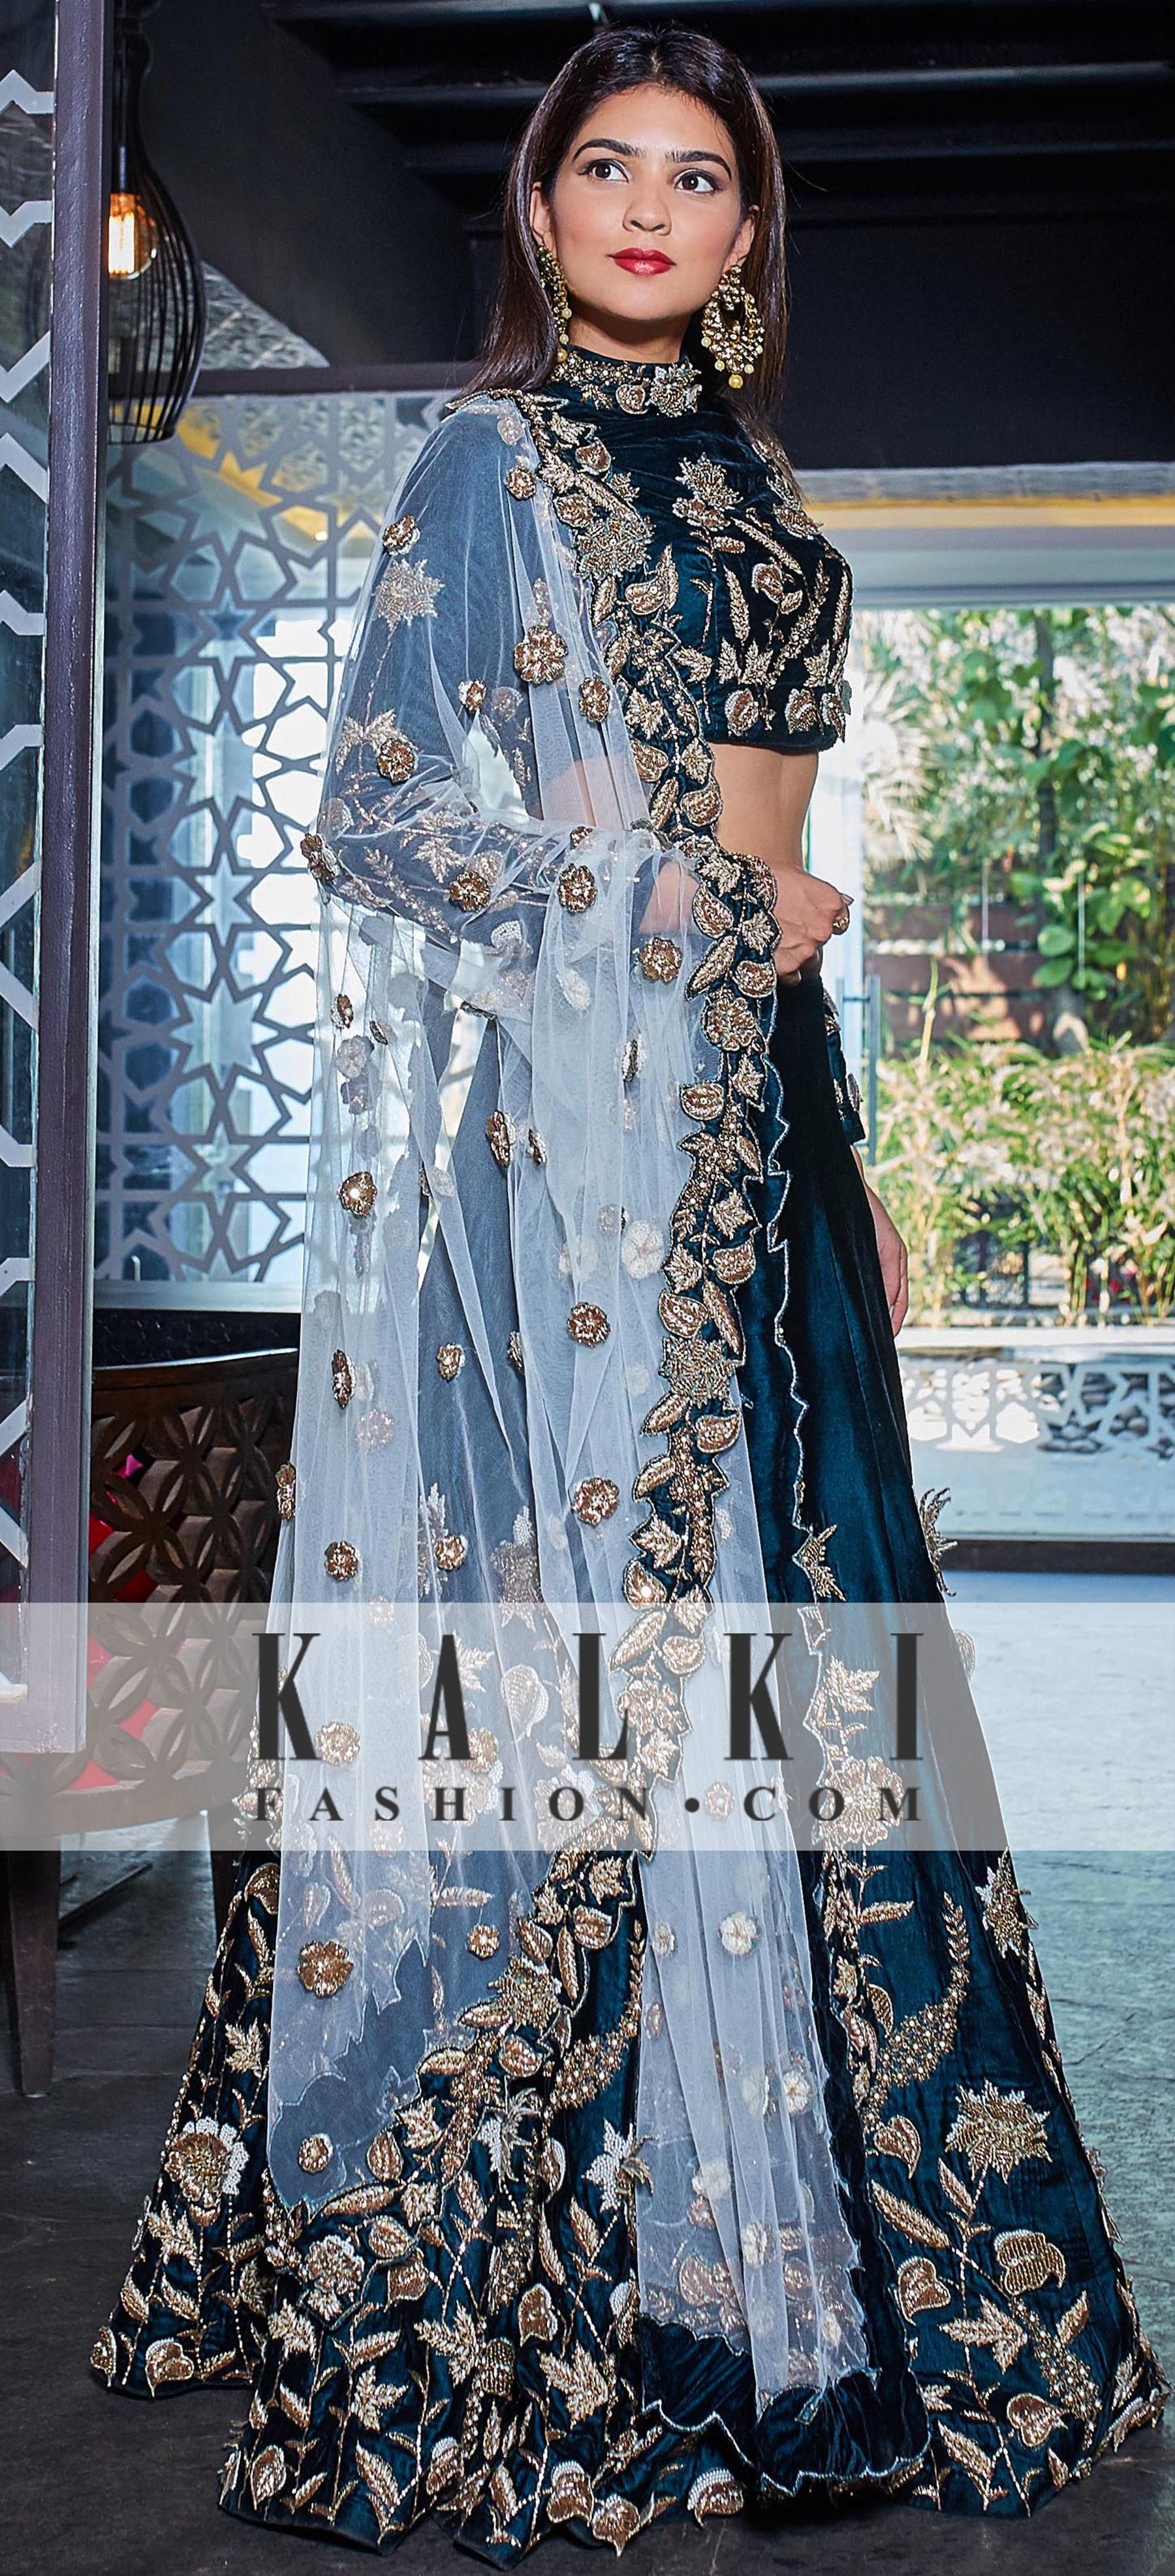 Madhura Fashion Blogger Indian Outfits Indian Attire Bollywood Fashion [ 3946 x 1800 Pixel ]